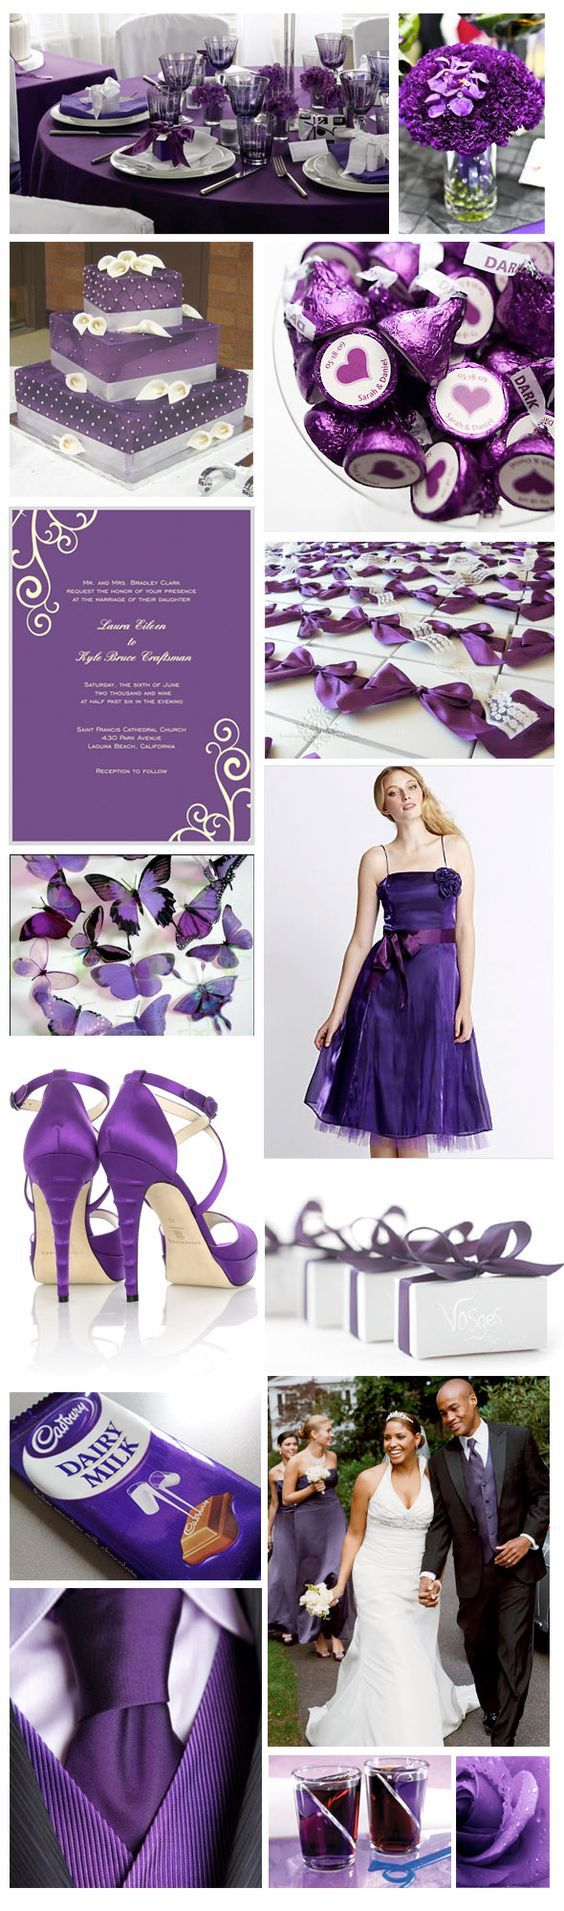 cadbury-purple-wedding-theme-ideas